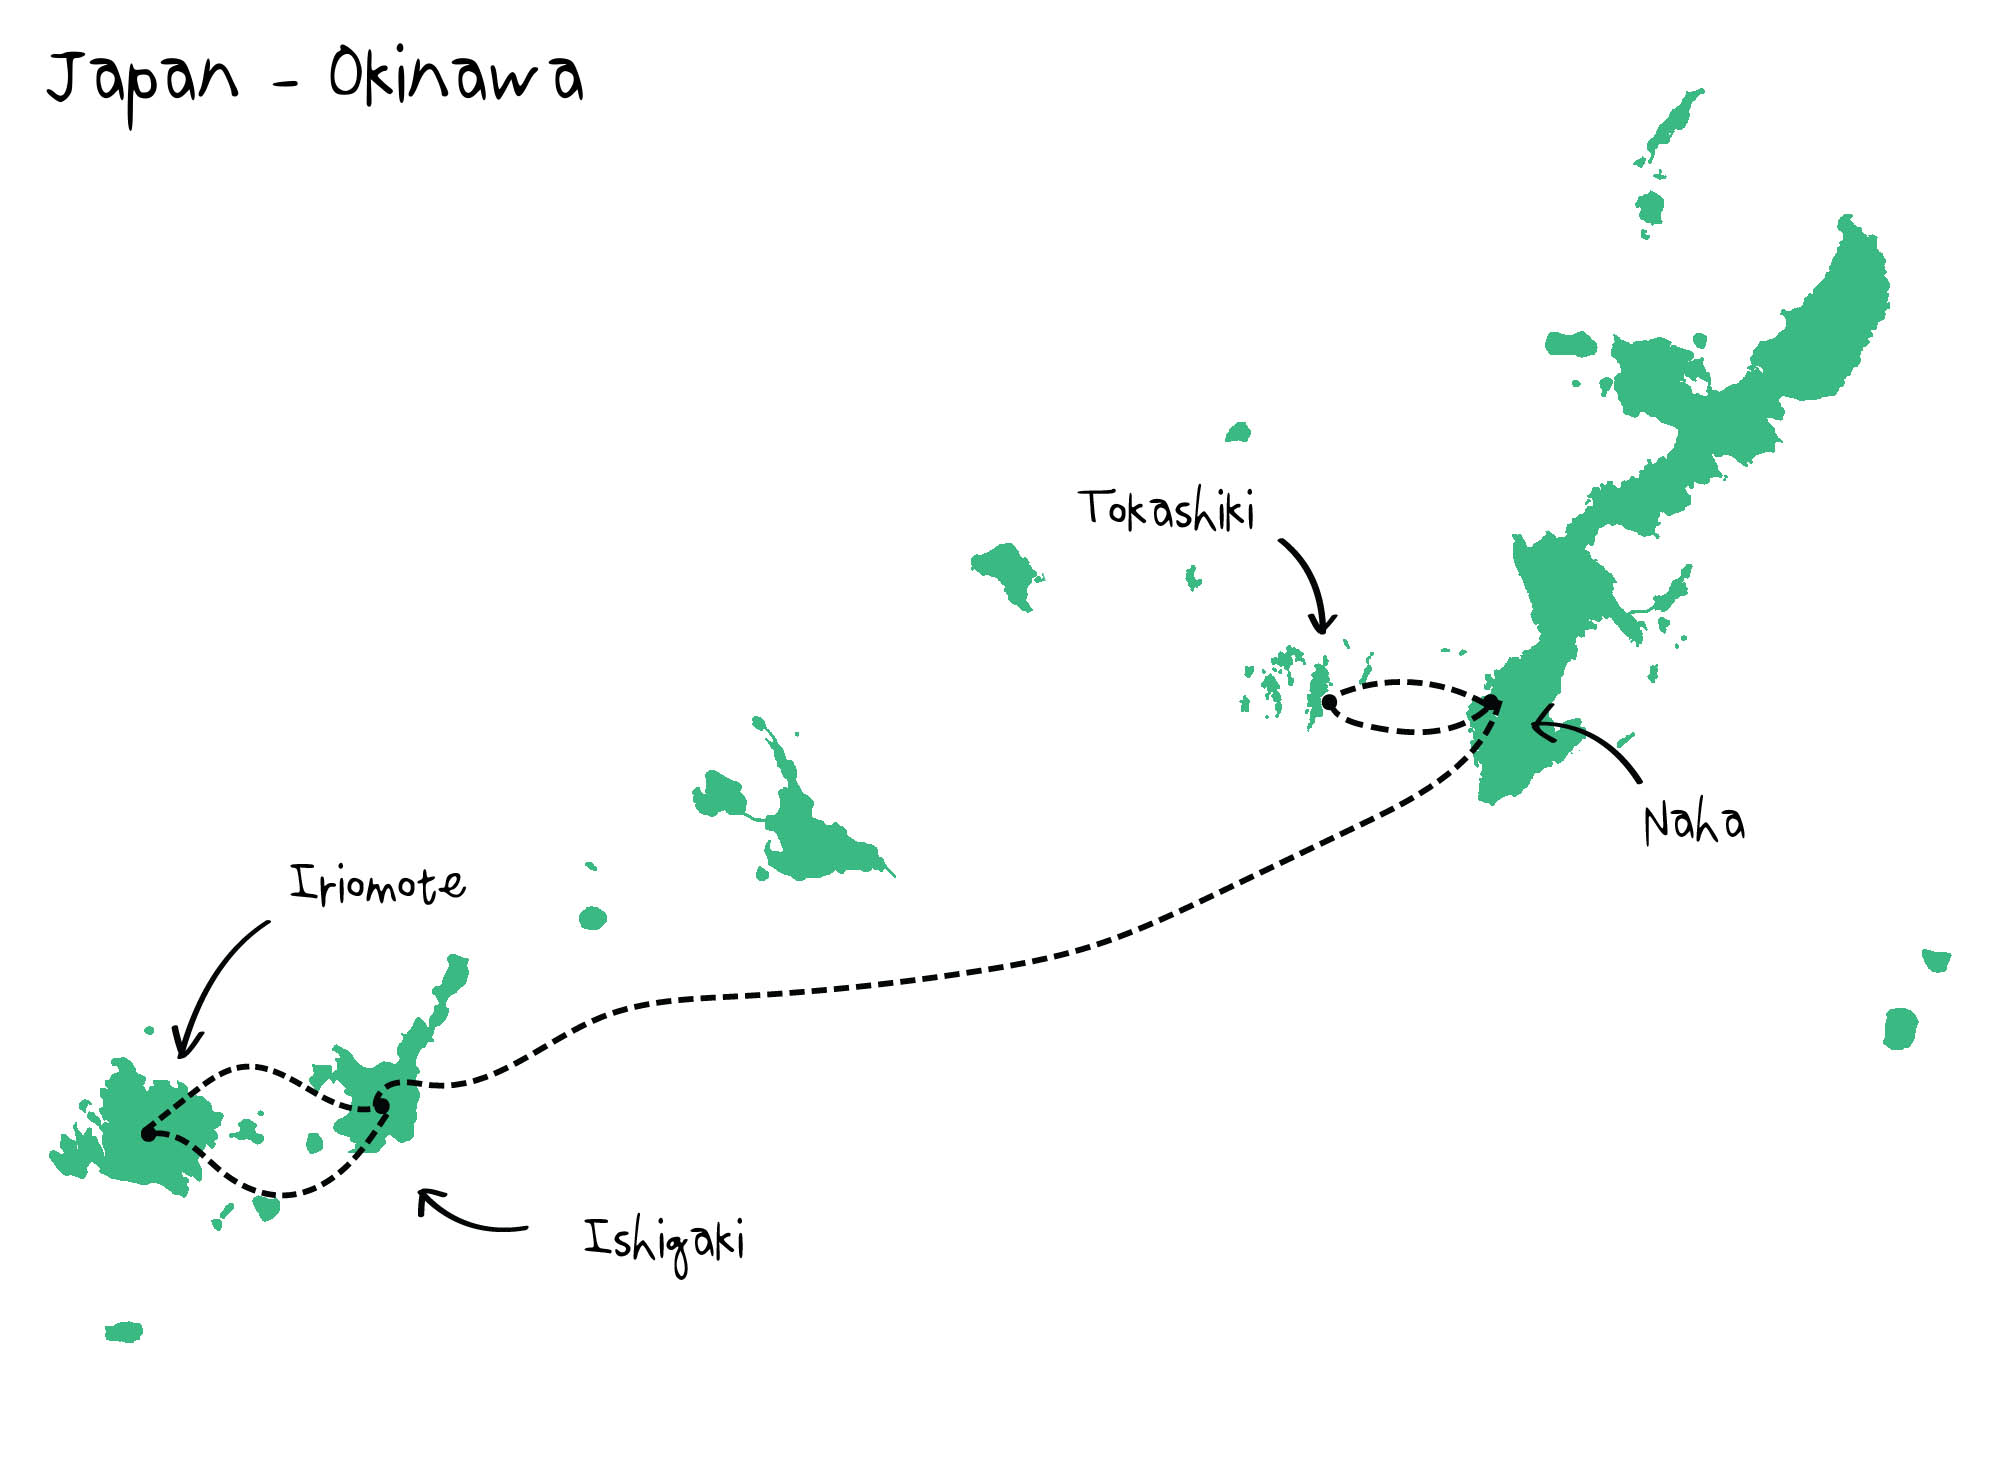 Route Okinawa